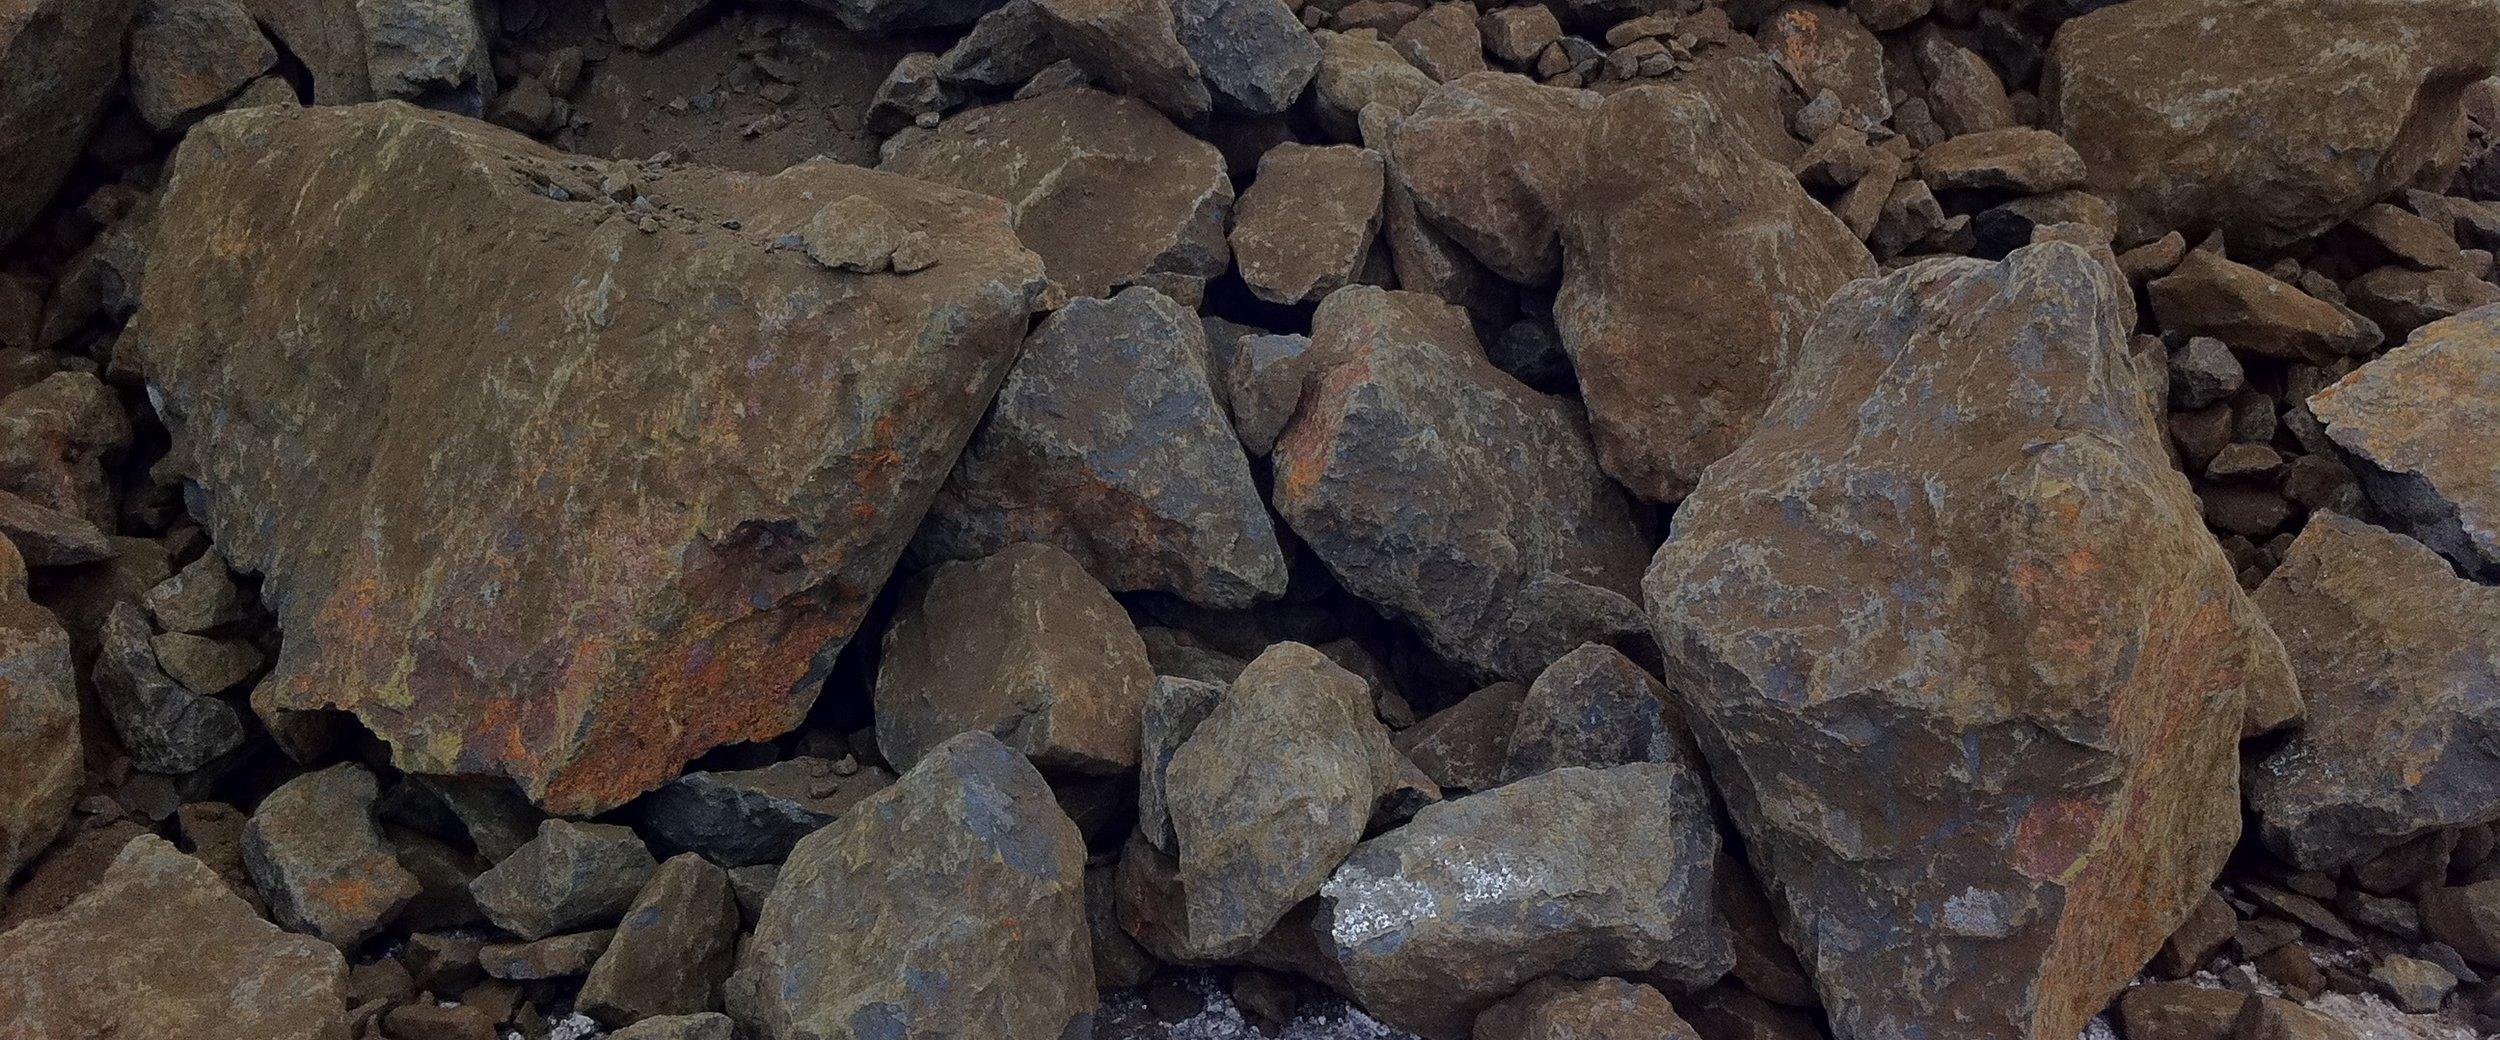 PRISM Transforms Its Minerals